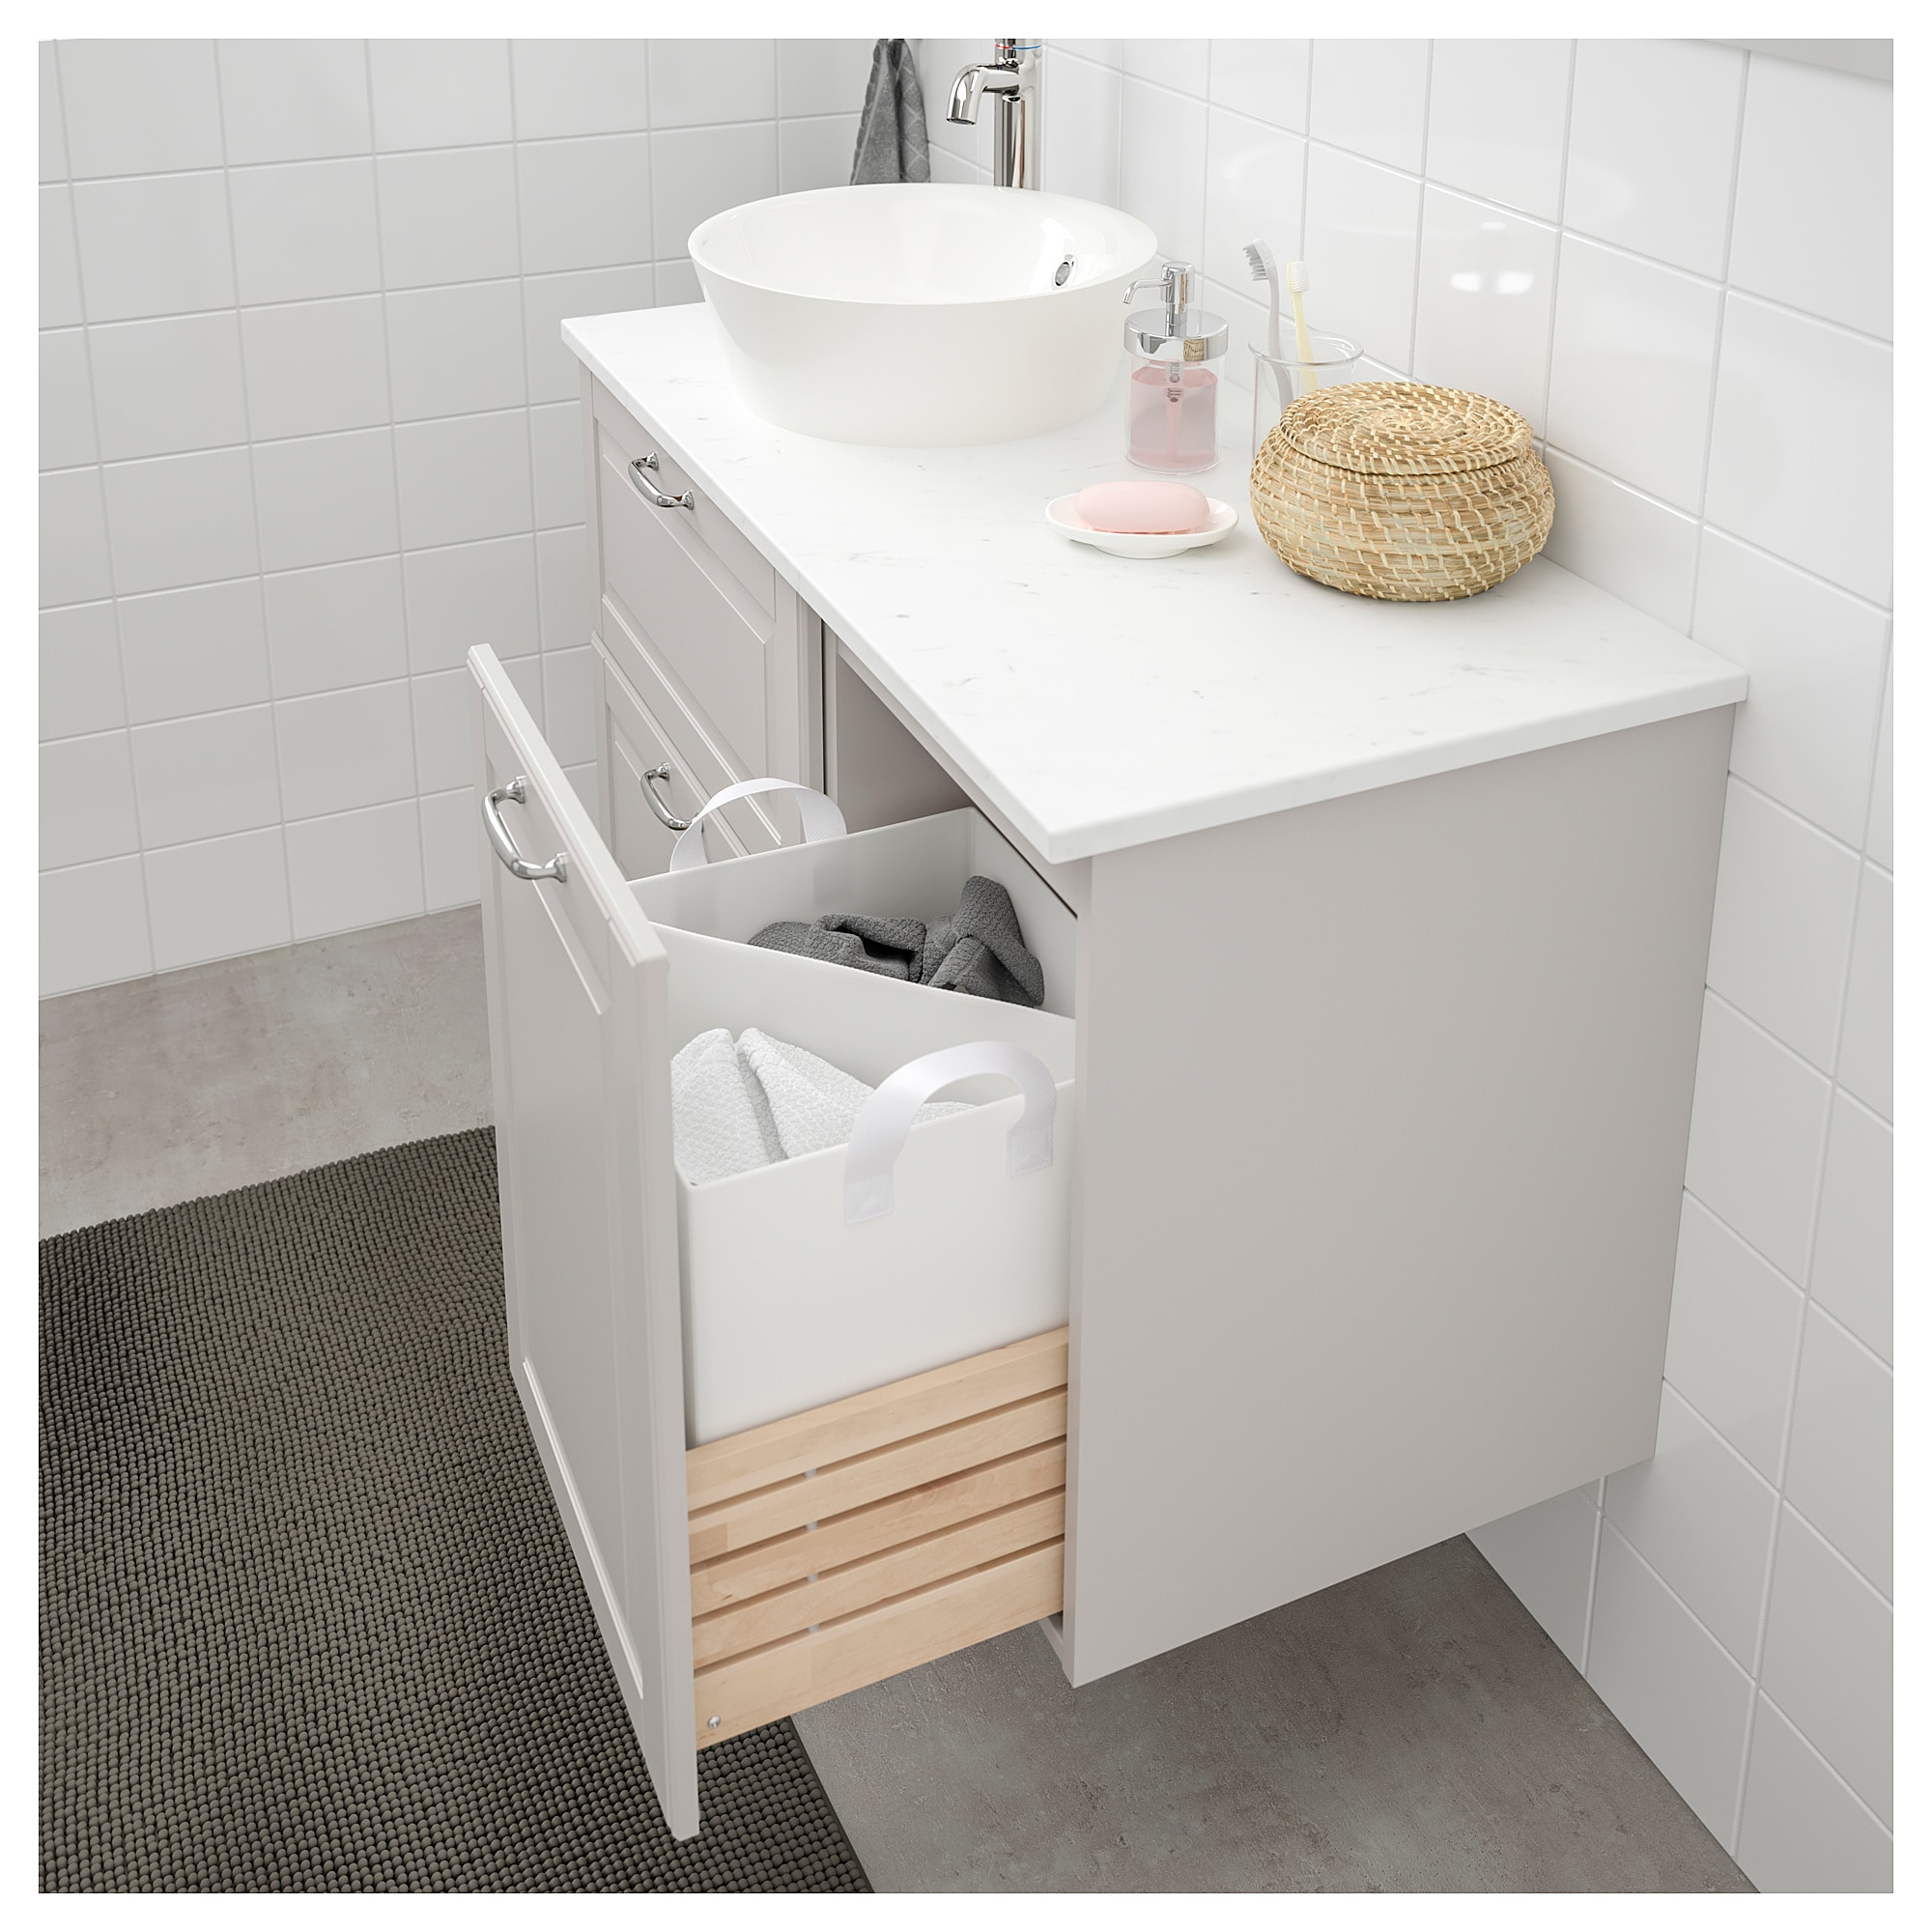 Godmorgon Wascheschrank Kasjon Hellgrau In 2020 Ikea Ikea